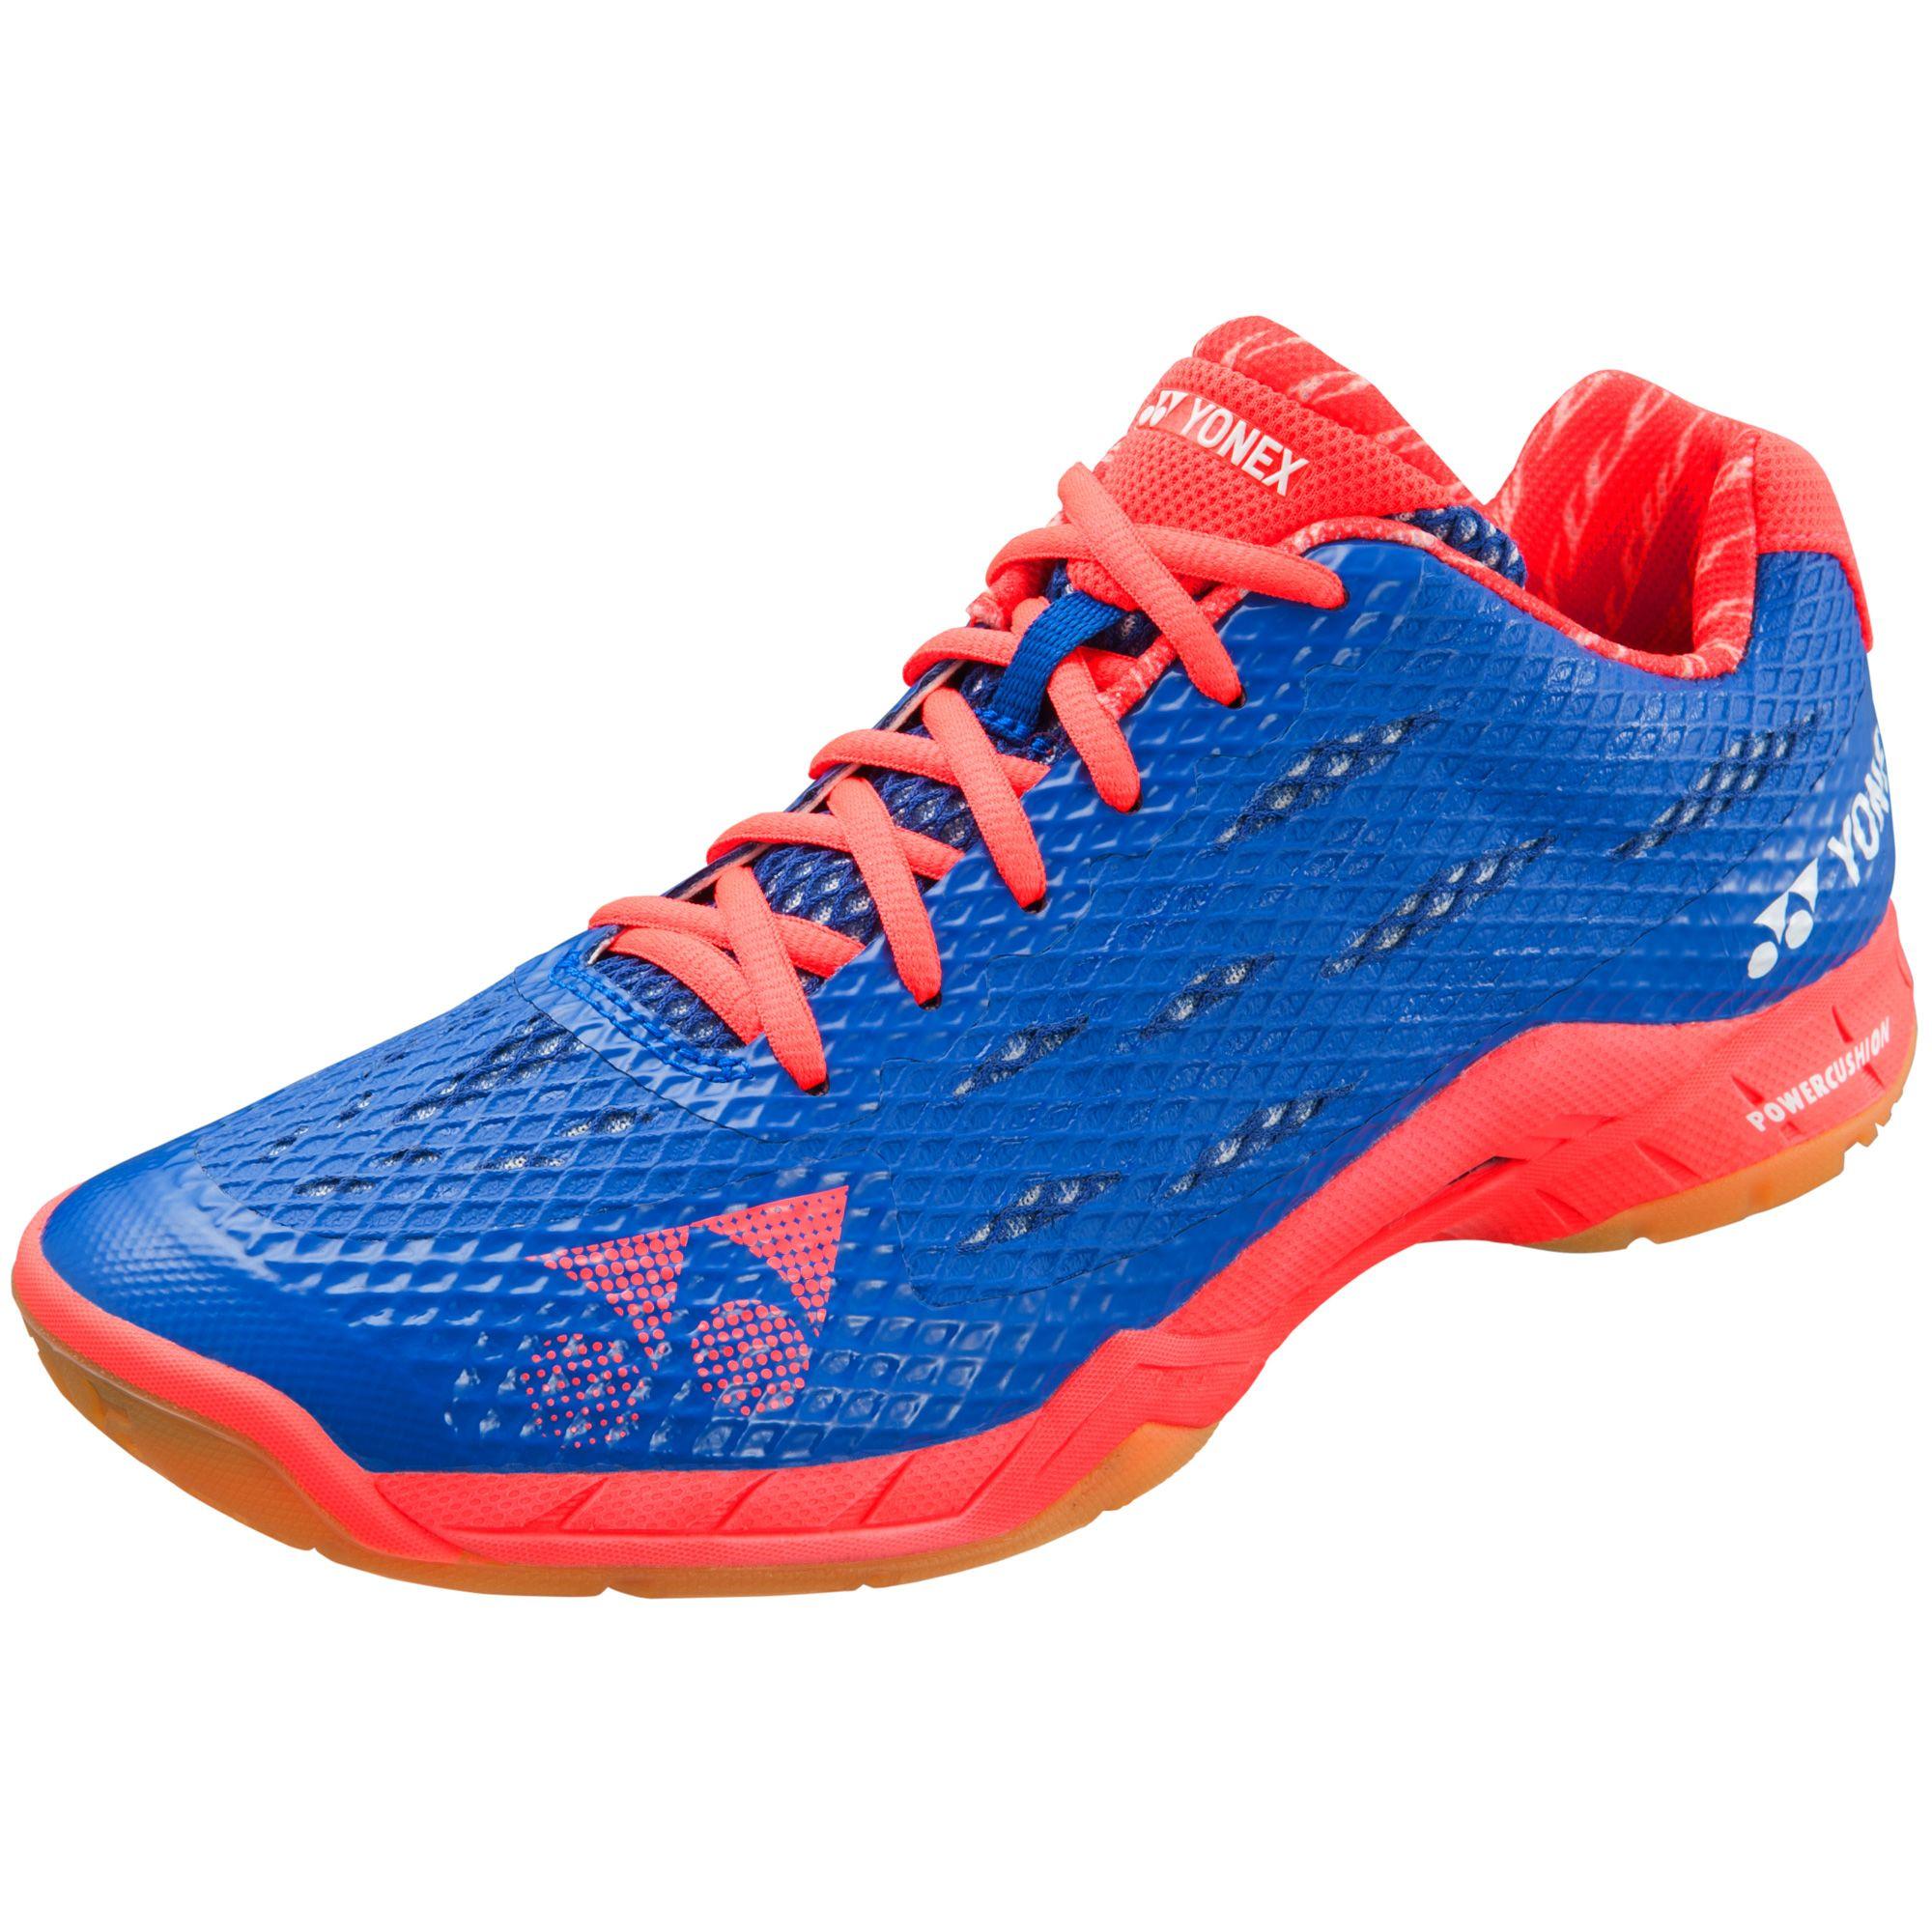 Yonex Tennis Shoes Review